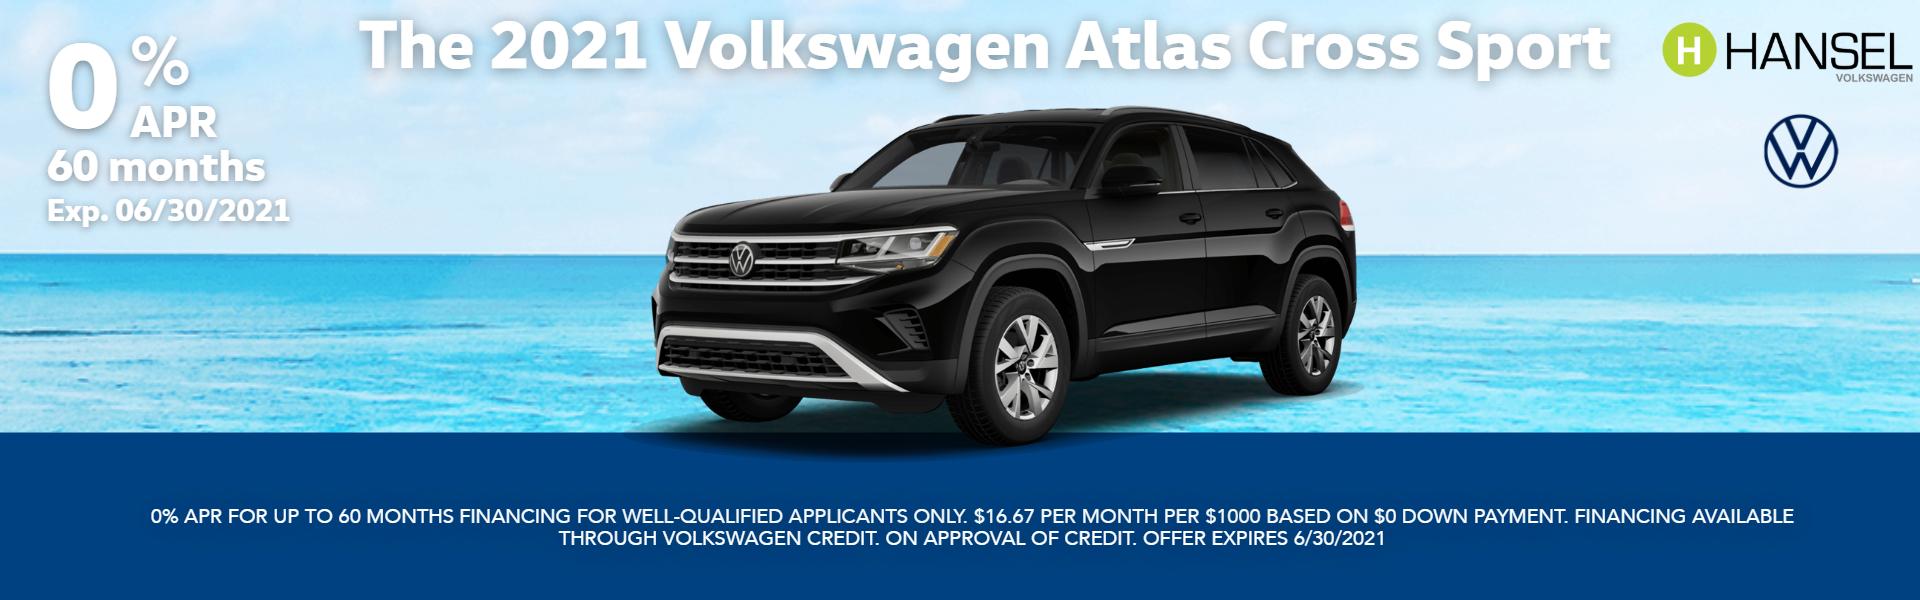 2021_Volkswagen_Atlas Cross Sport_S_Mon Jun 07 2021 11_19_50 GMT-0700 (Pacific Daylight Time)